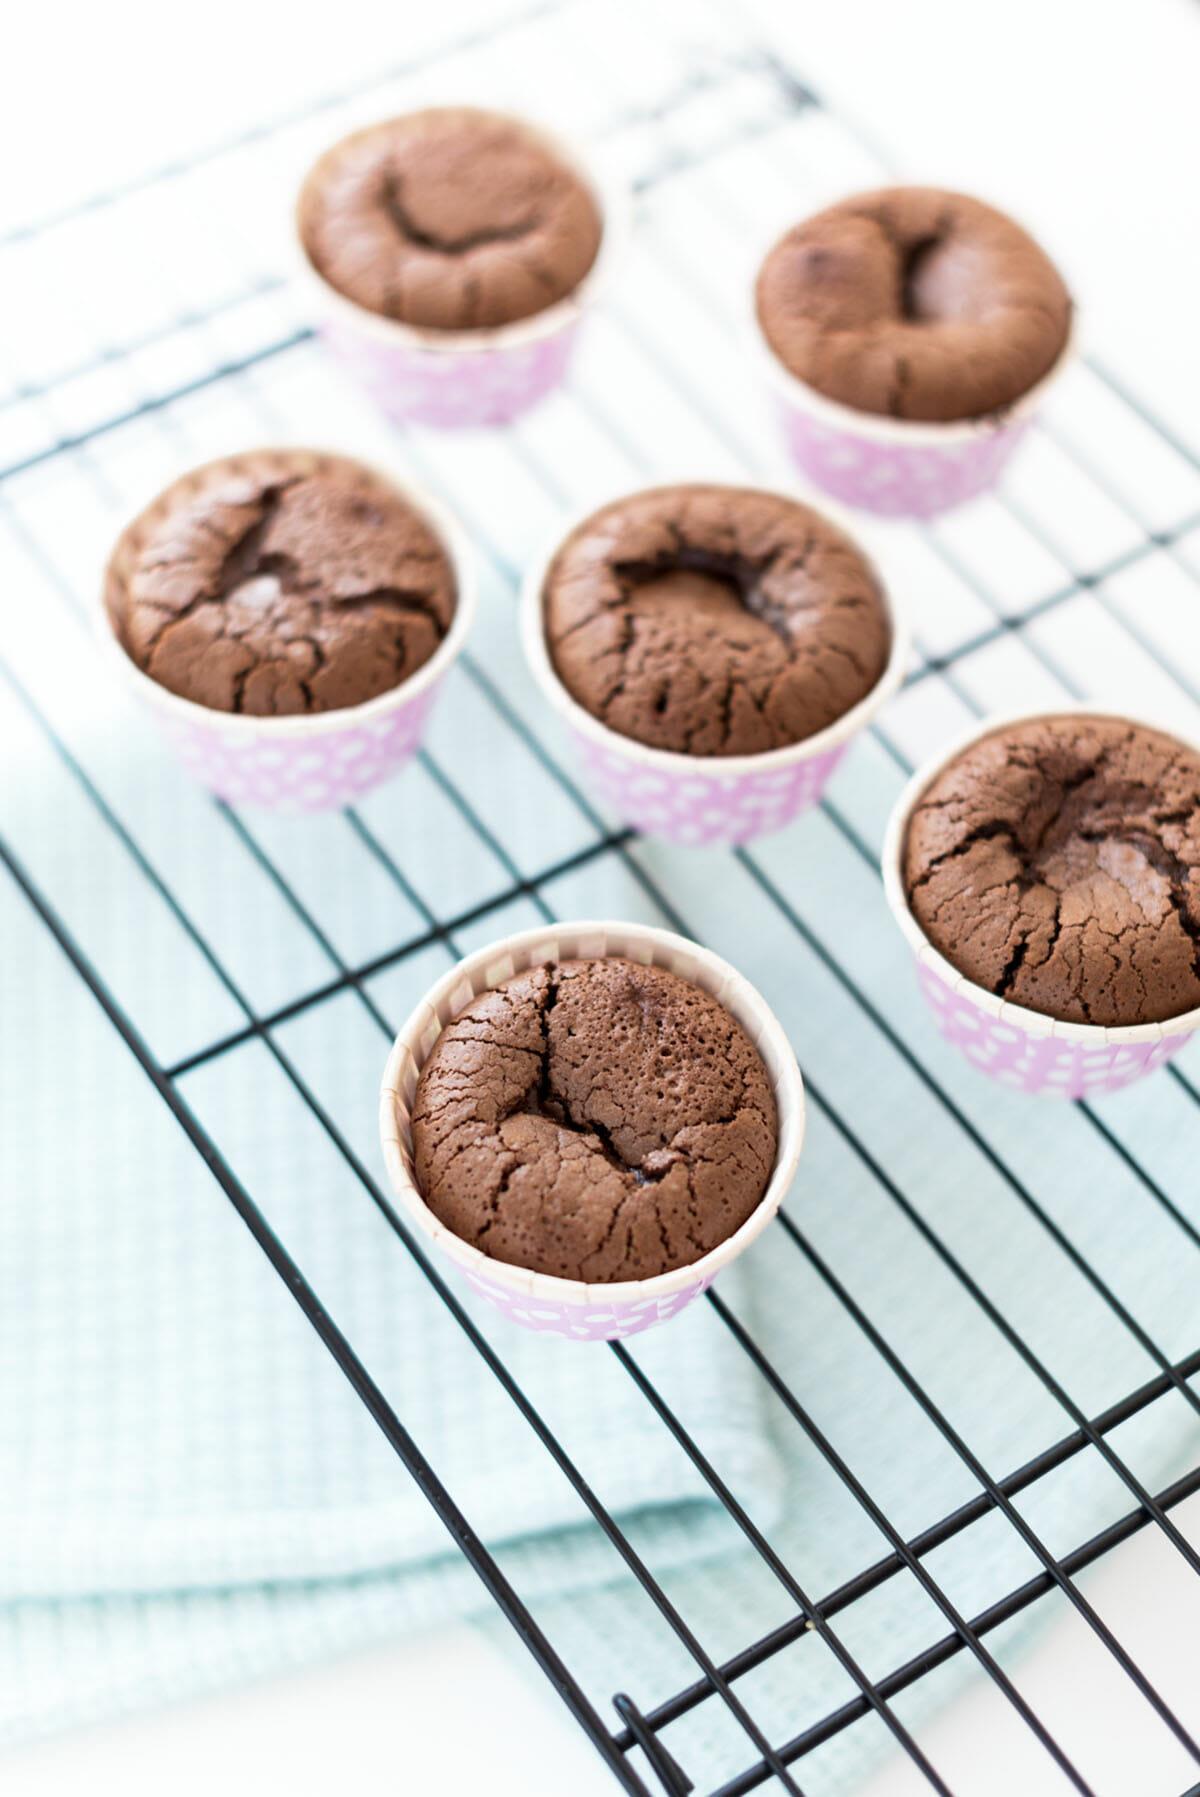 Moelleux Chocolat au Coeur Coulant | Lilie Bakery